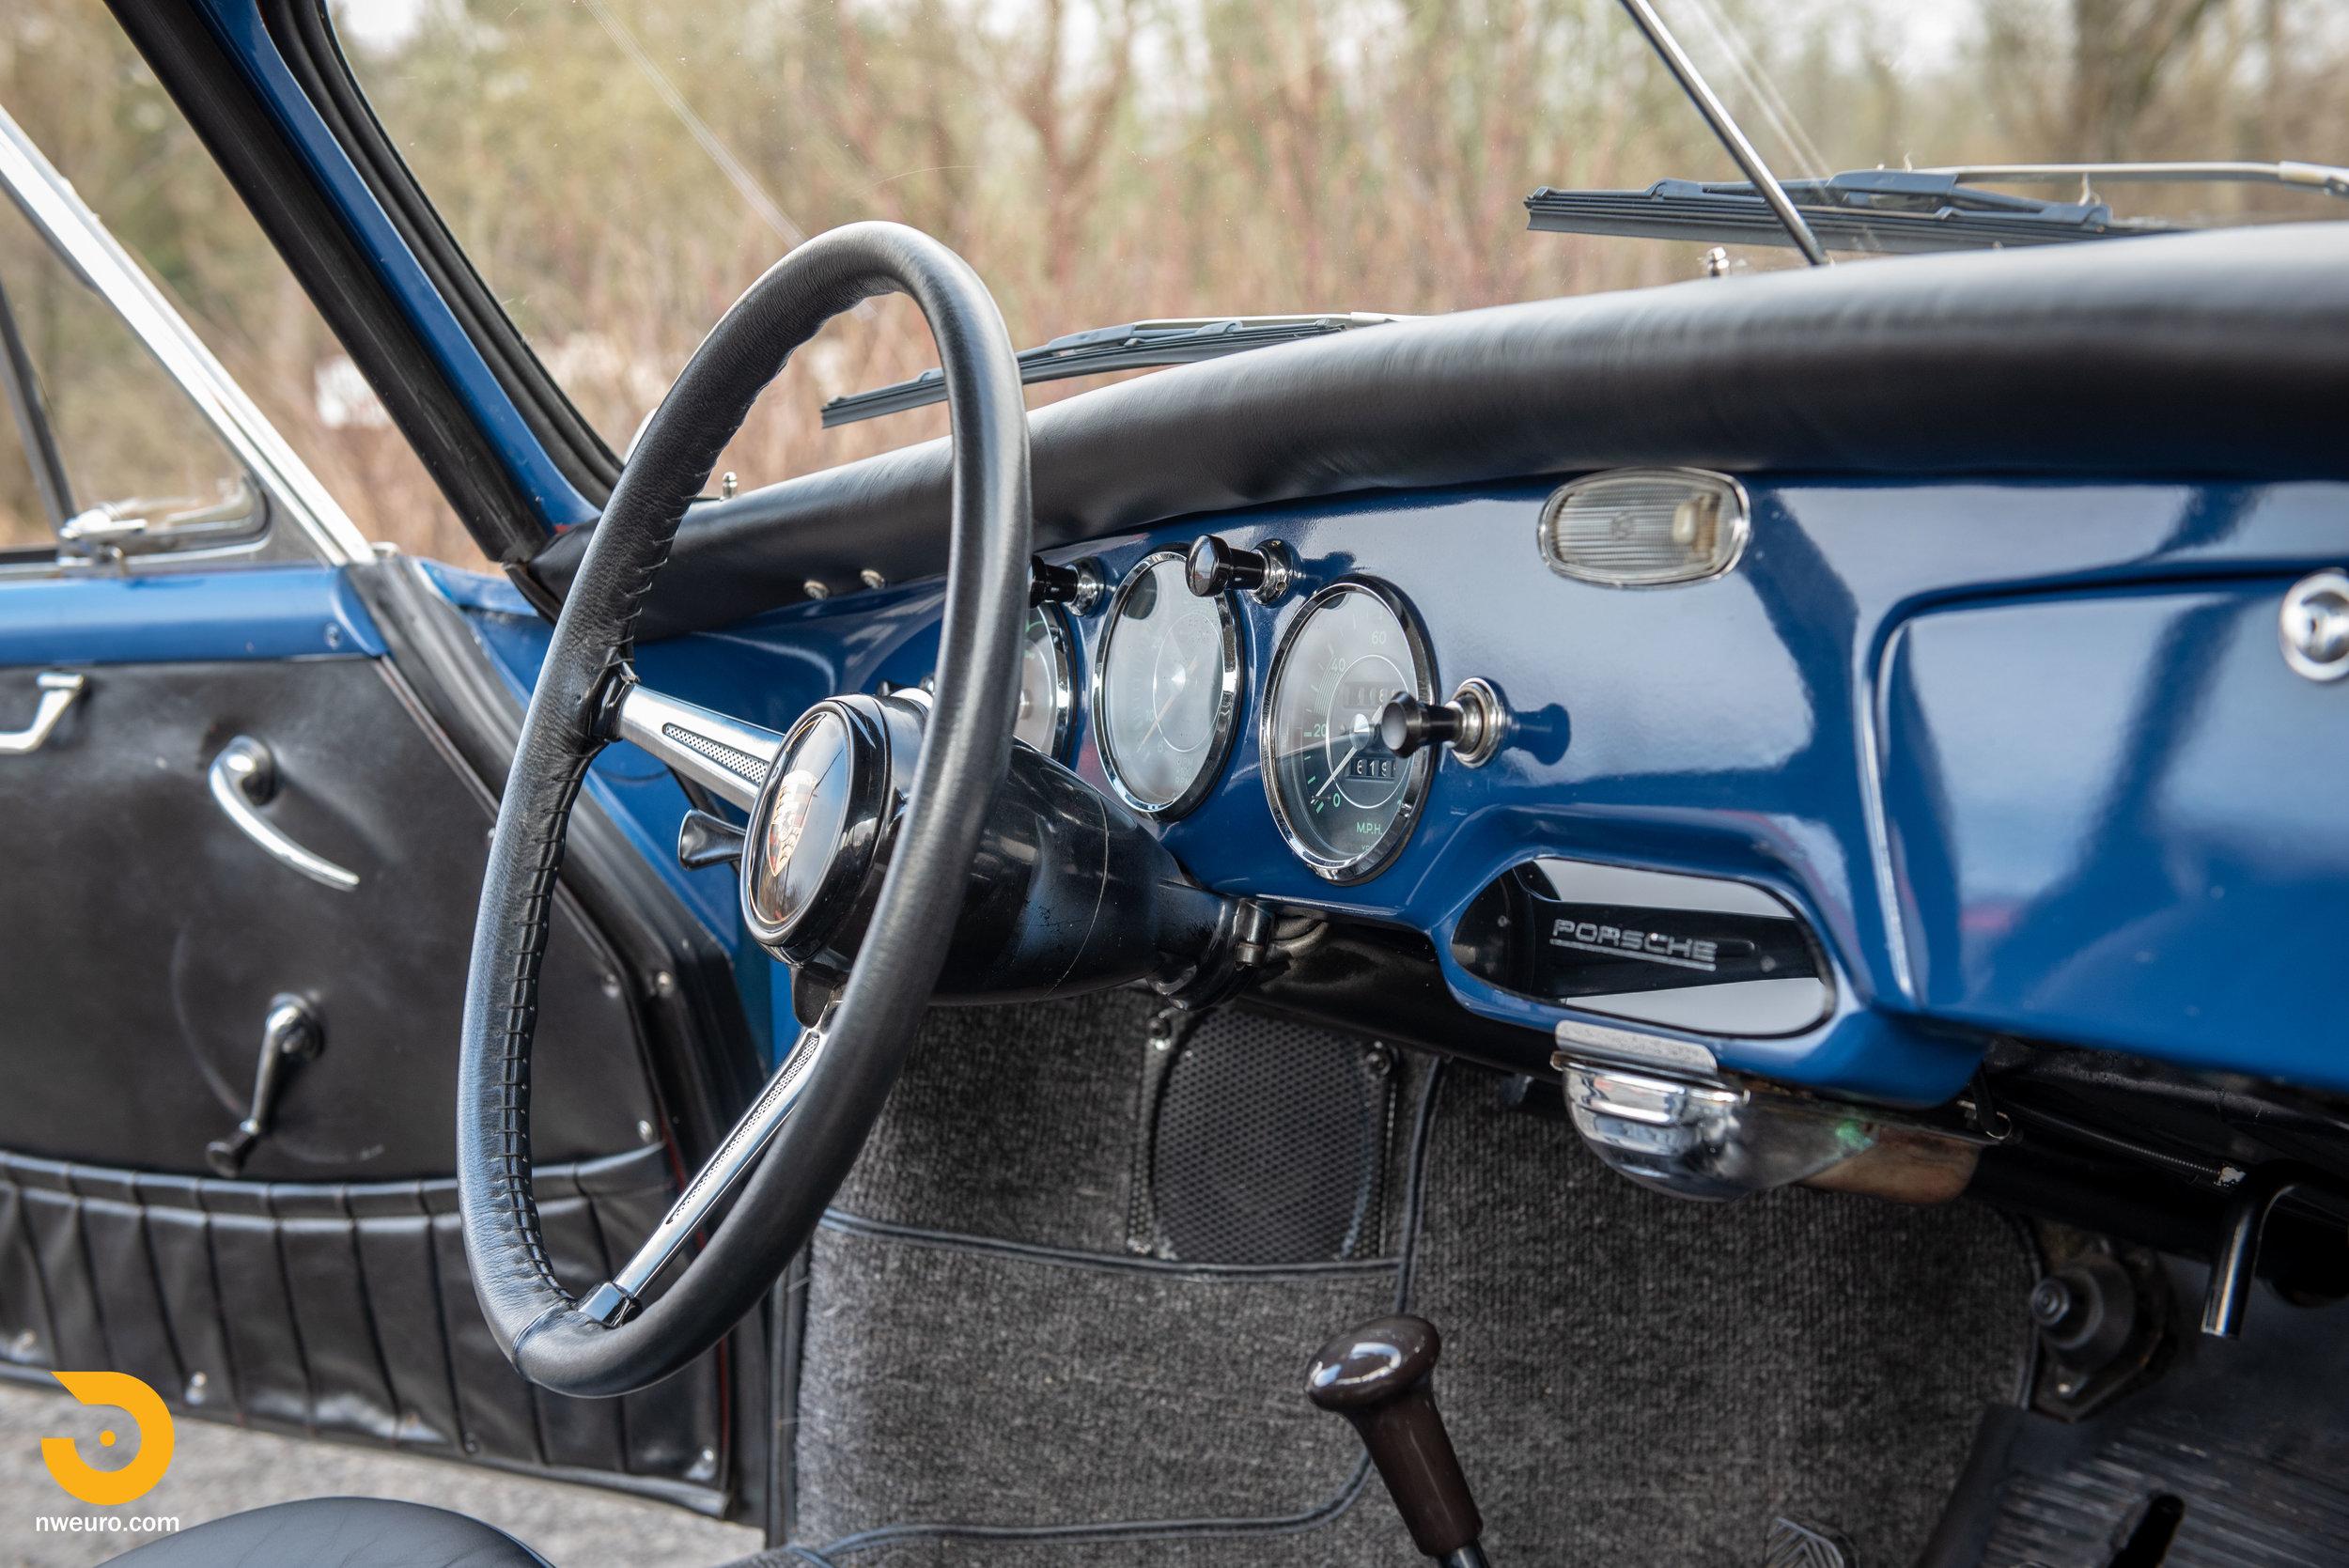 1960 Porsche 356 Hardtop Cab 1600 Super-75.jpg